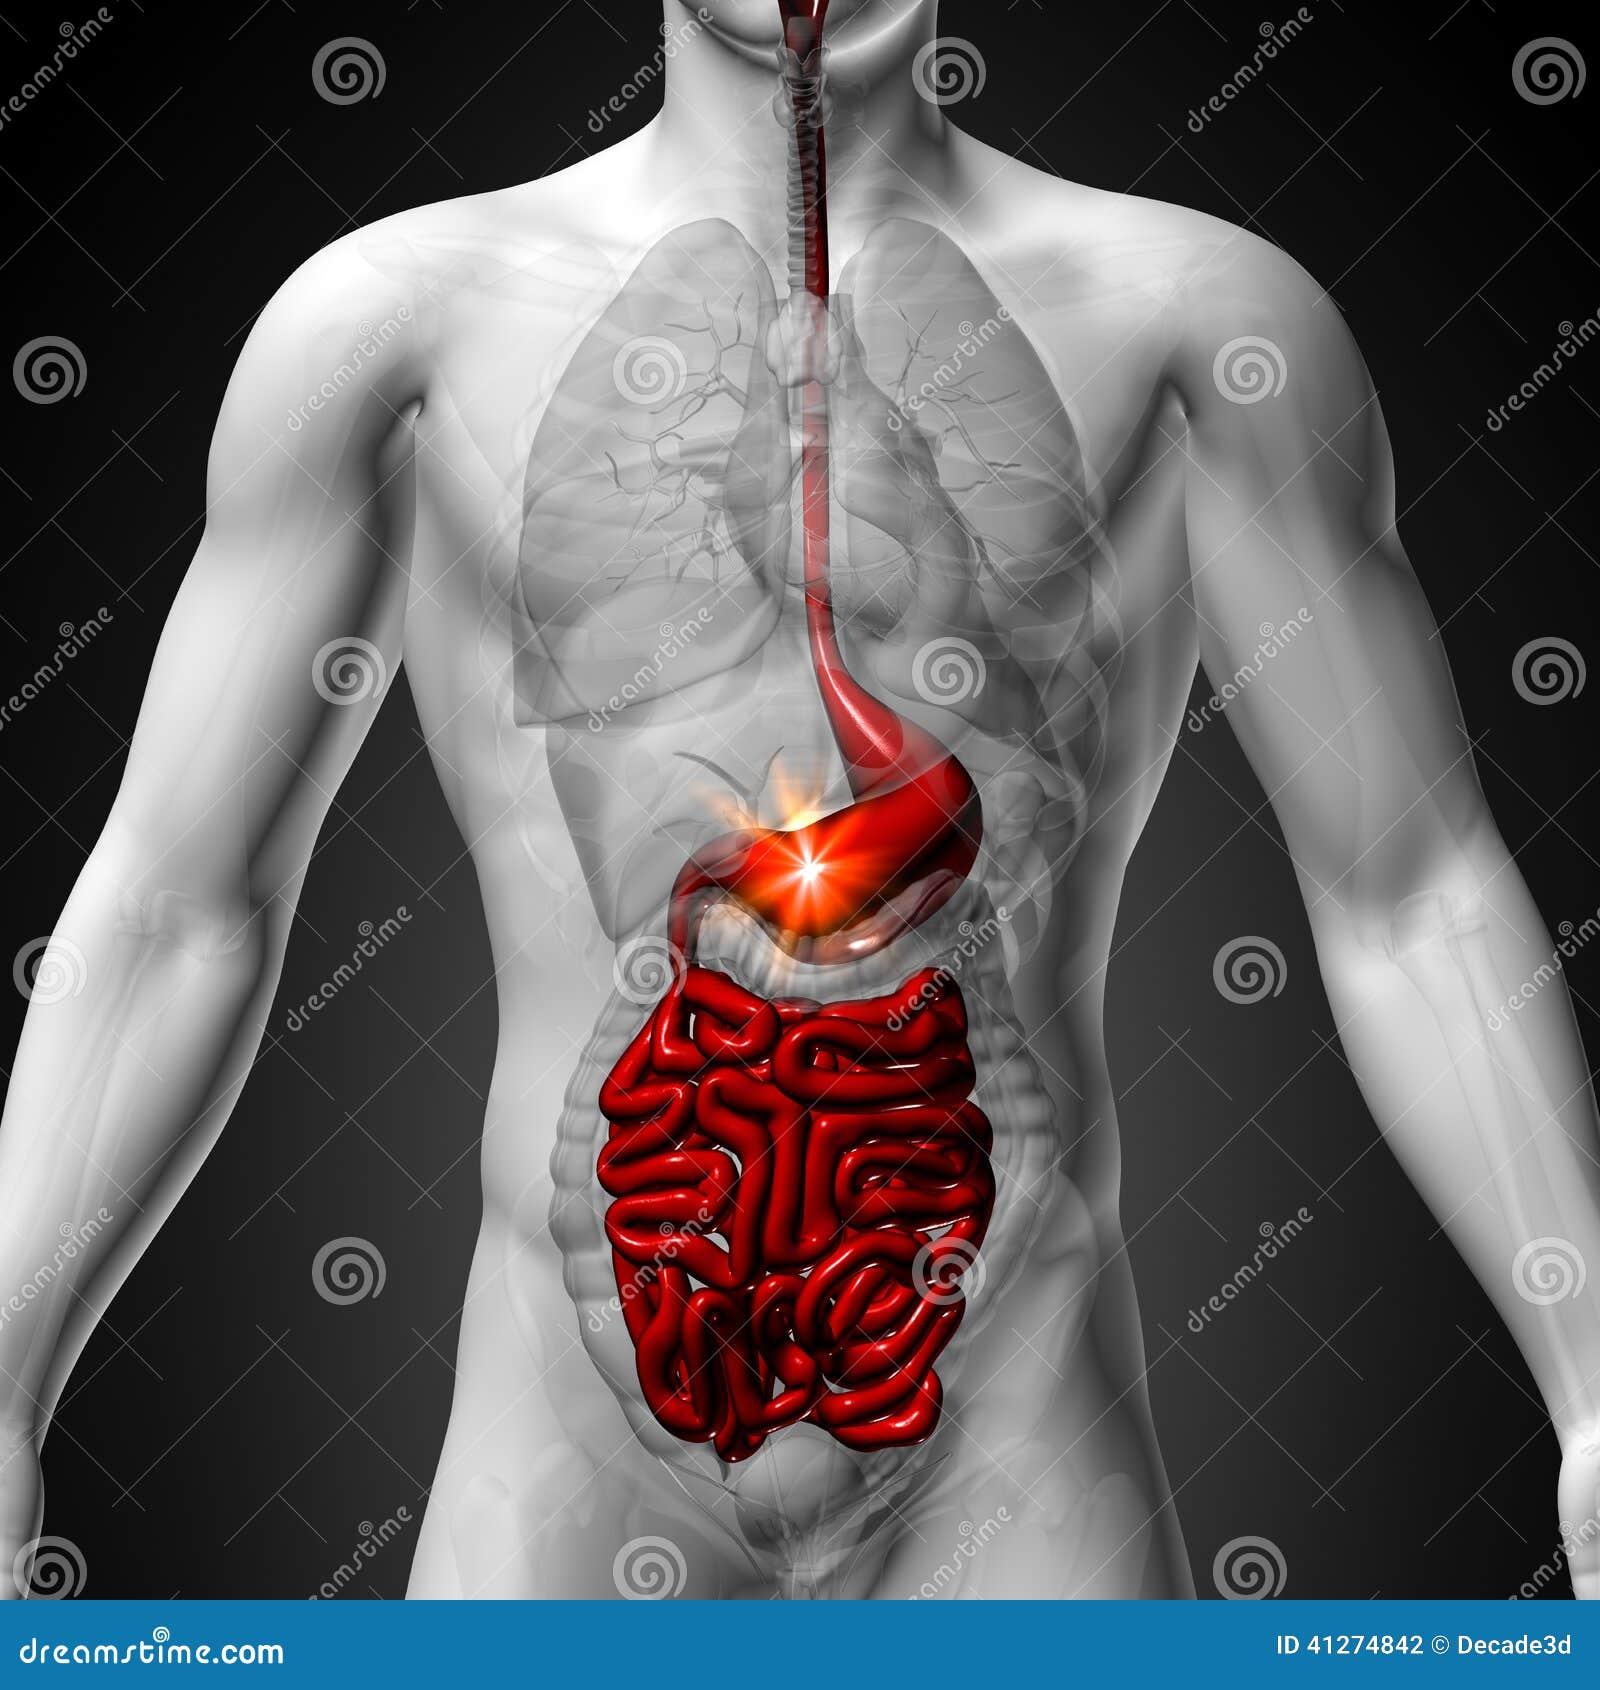 Stomach / Guts / Small Interstine - Male Anatomy Of Human Organs - X ...